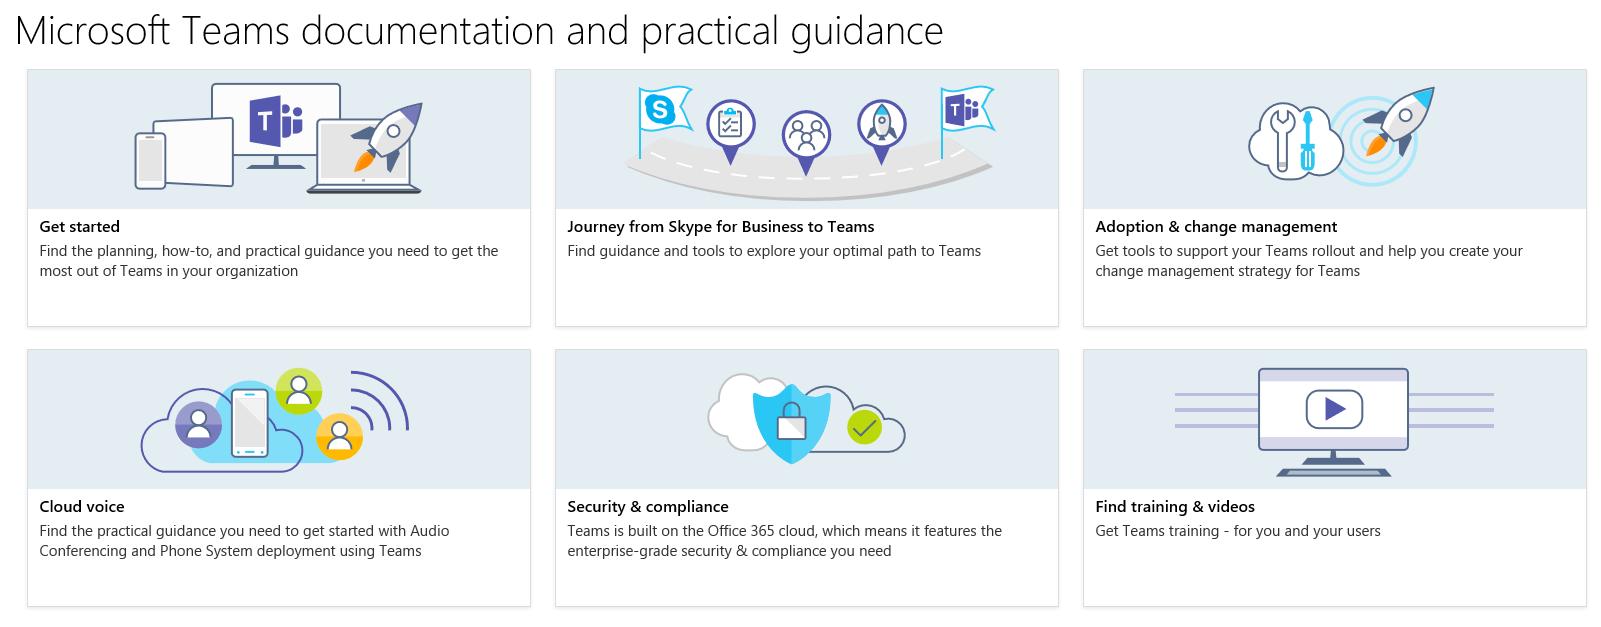 2018-02-01 14_04_08-Microsoft Teams documentation and practical guidance _ Microsoft Docs - Internet